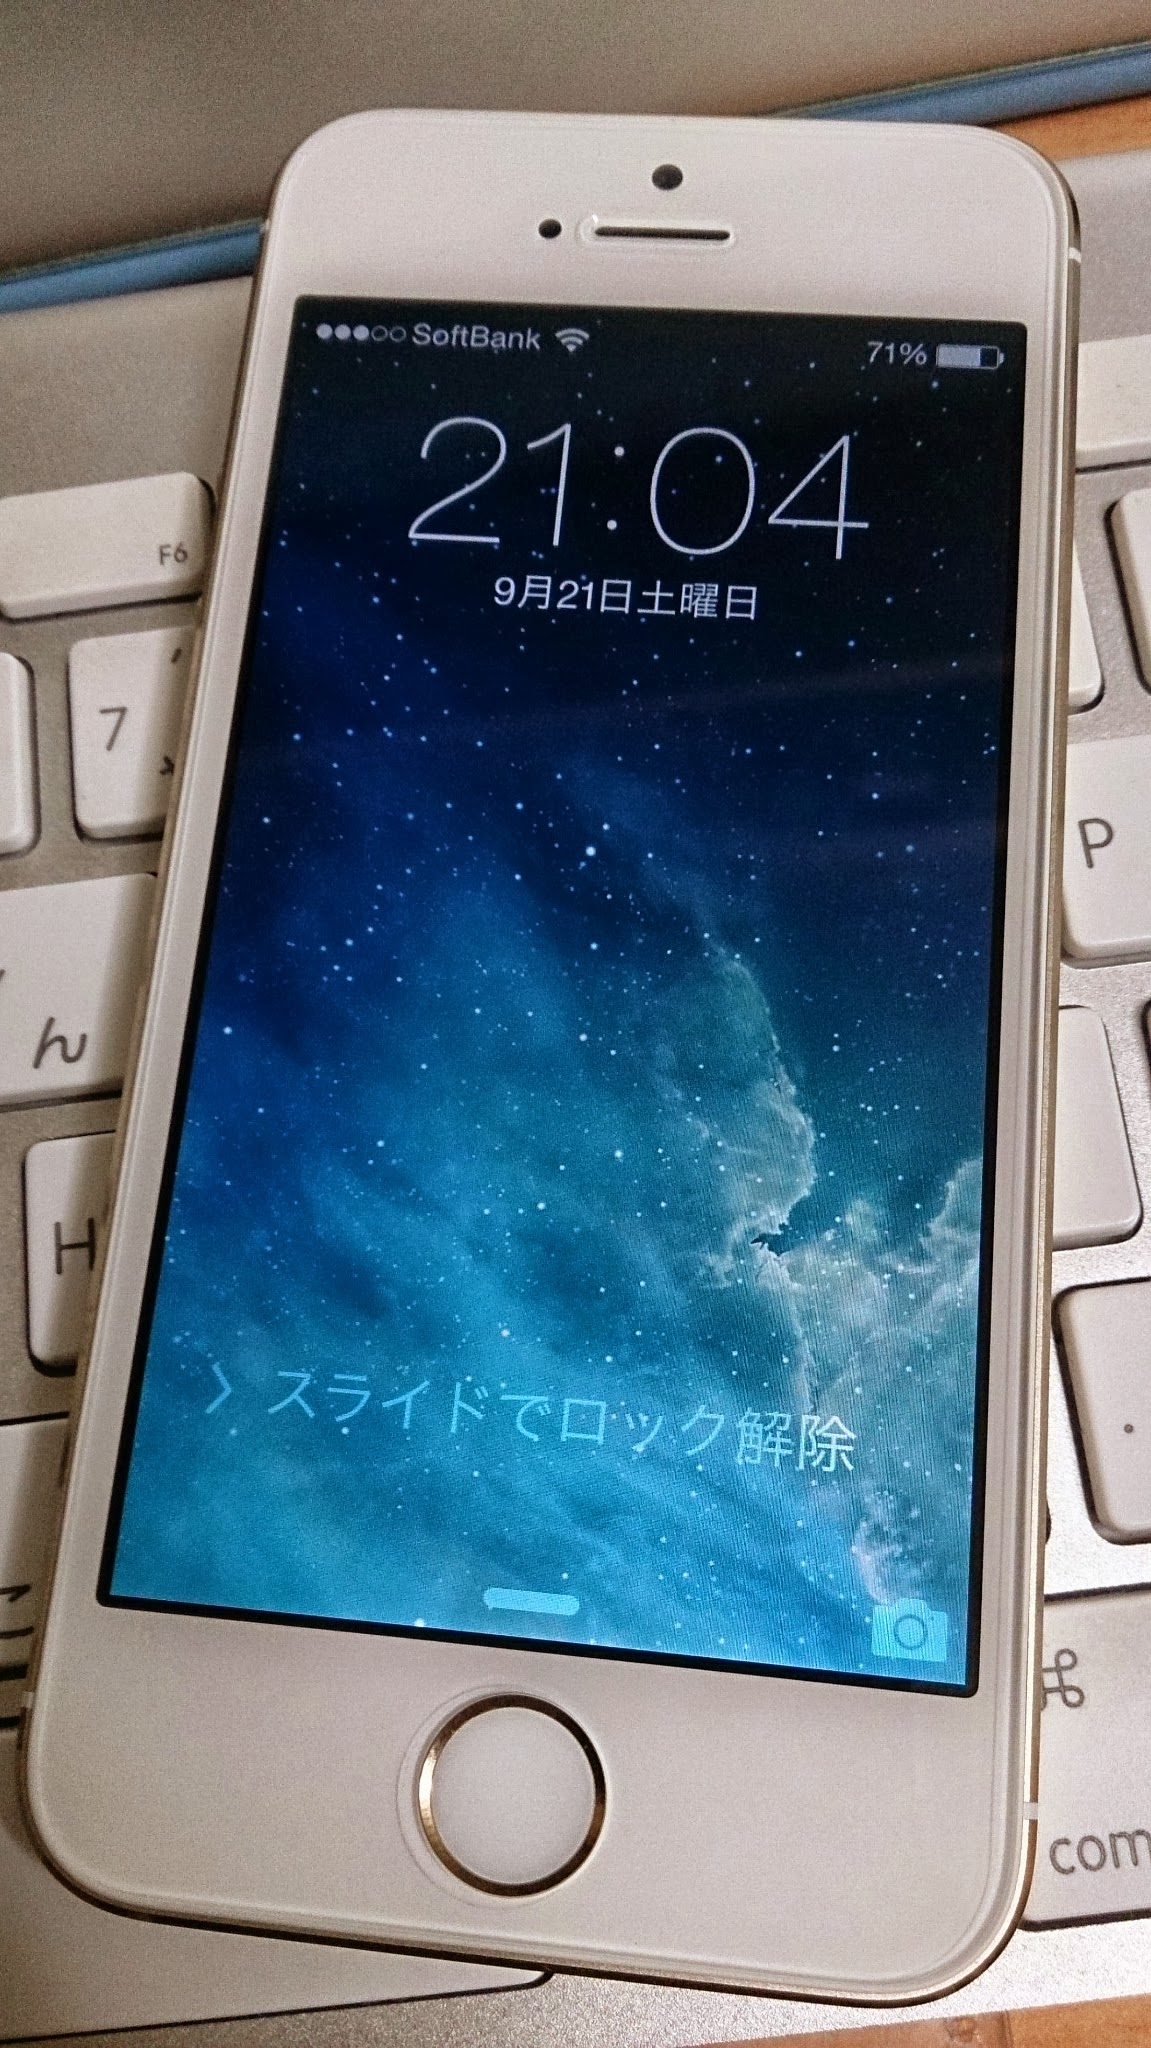 iPhone 5sシャンパンゴールド